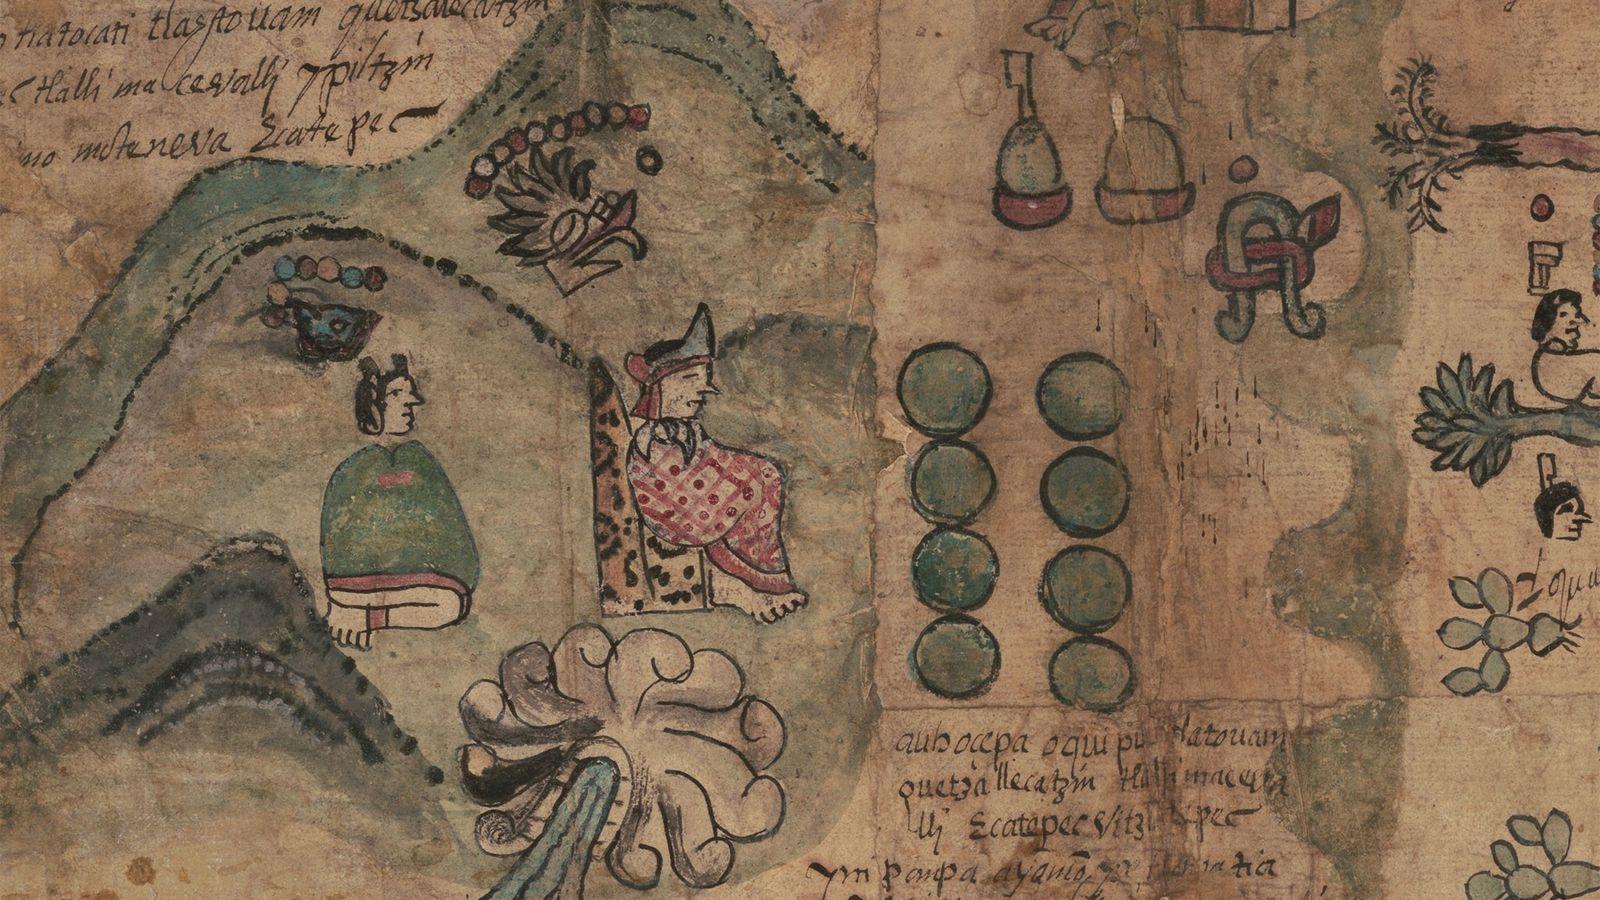 Raro Mapa Asteca do Século 16